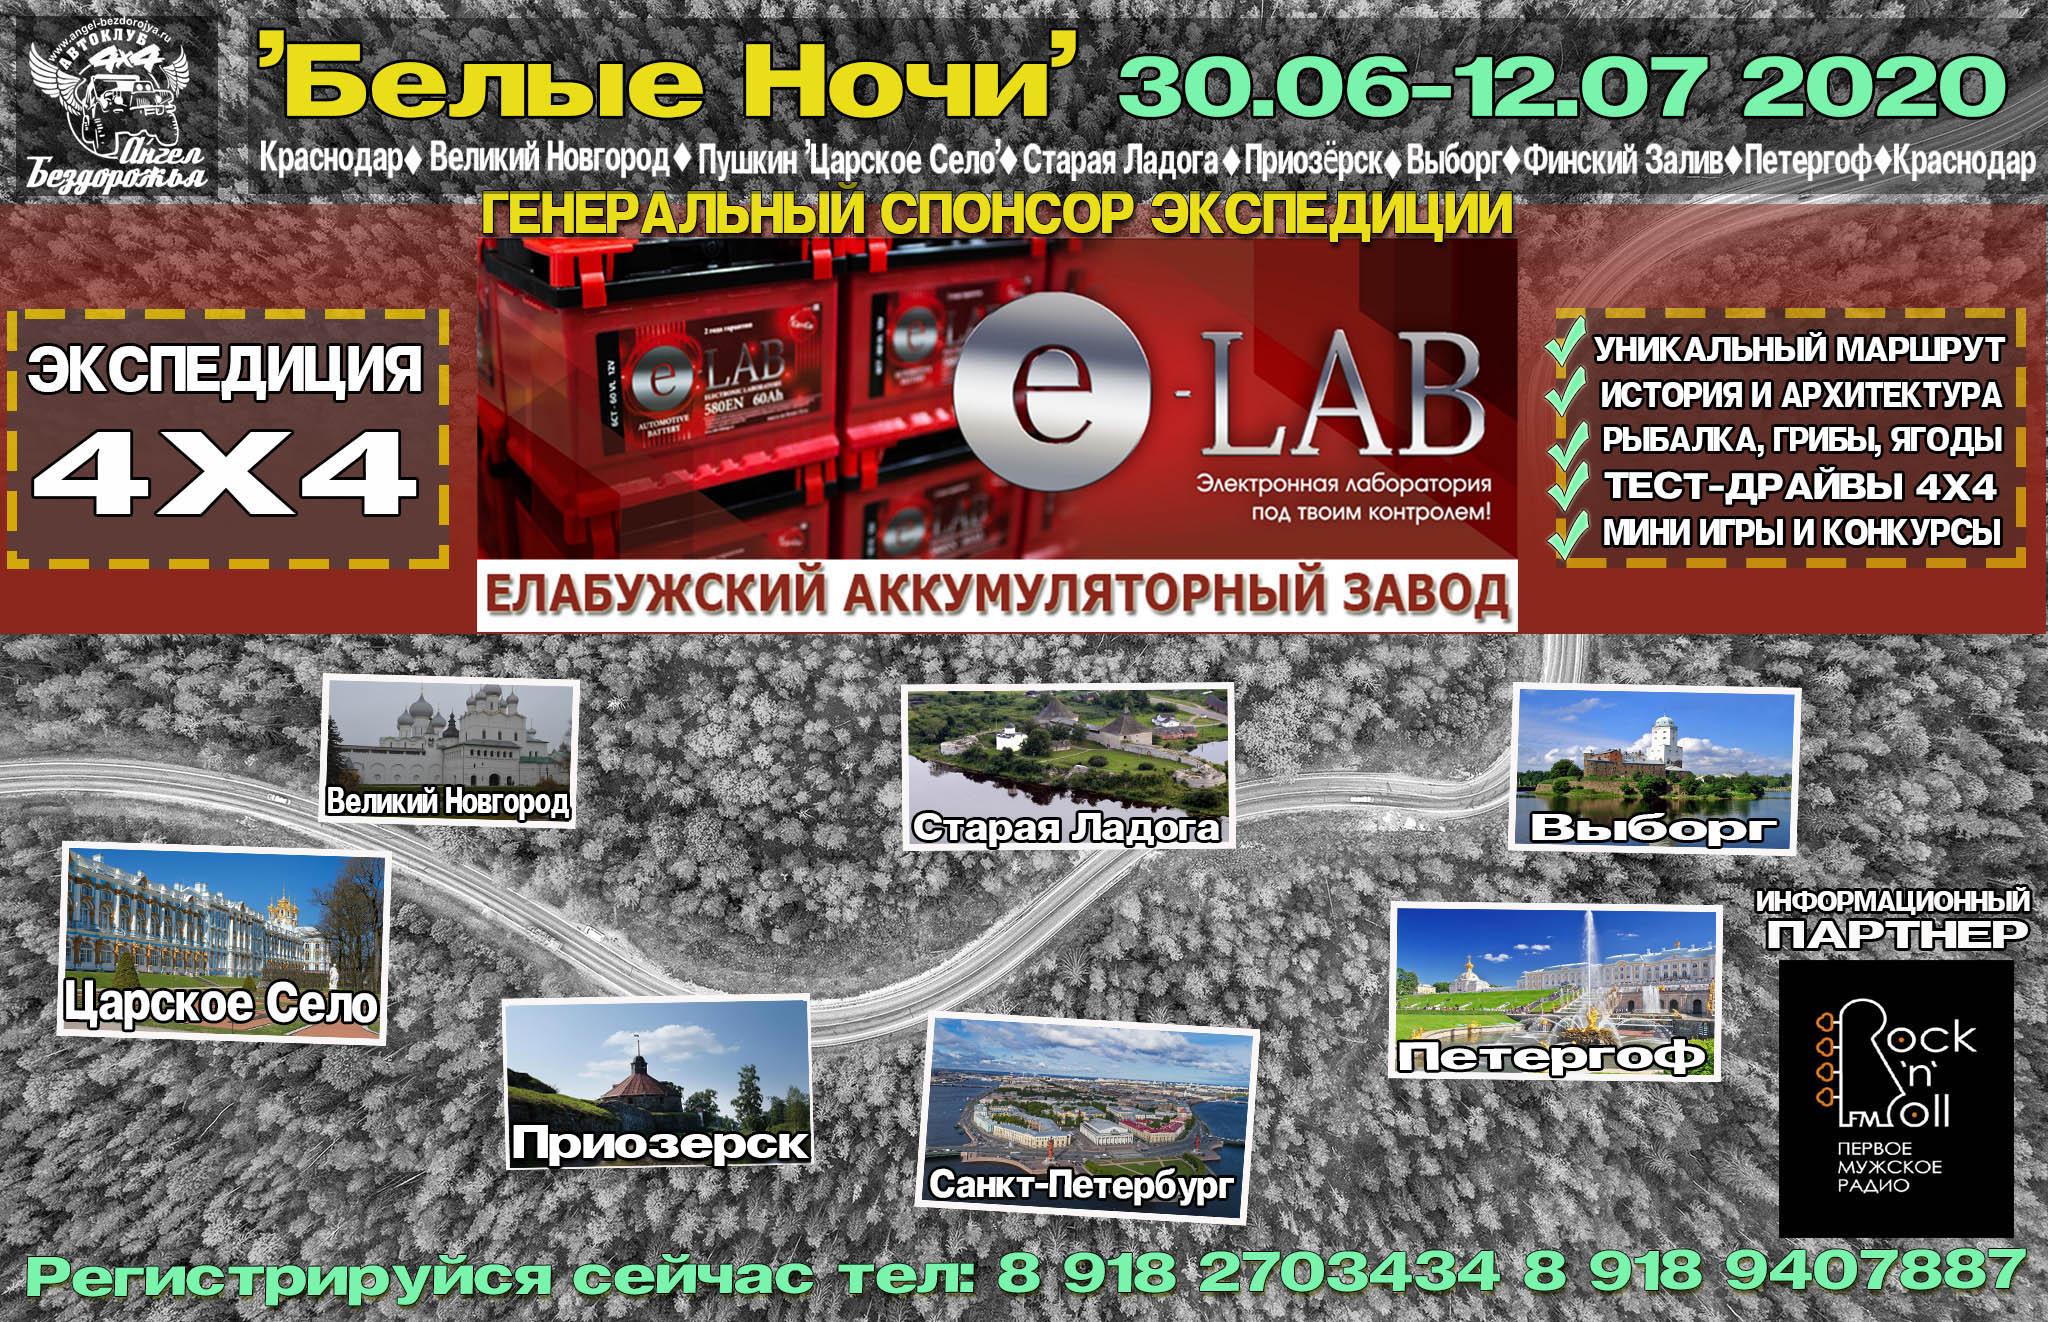 https://angel-bezdorojya.ru/wp-content/uploads/2020/06/belye-nochi3-1.jpg